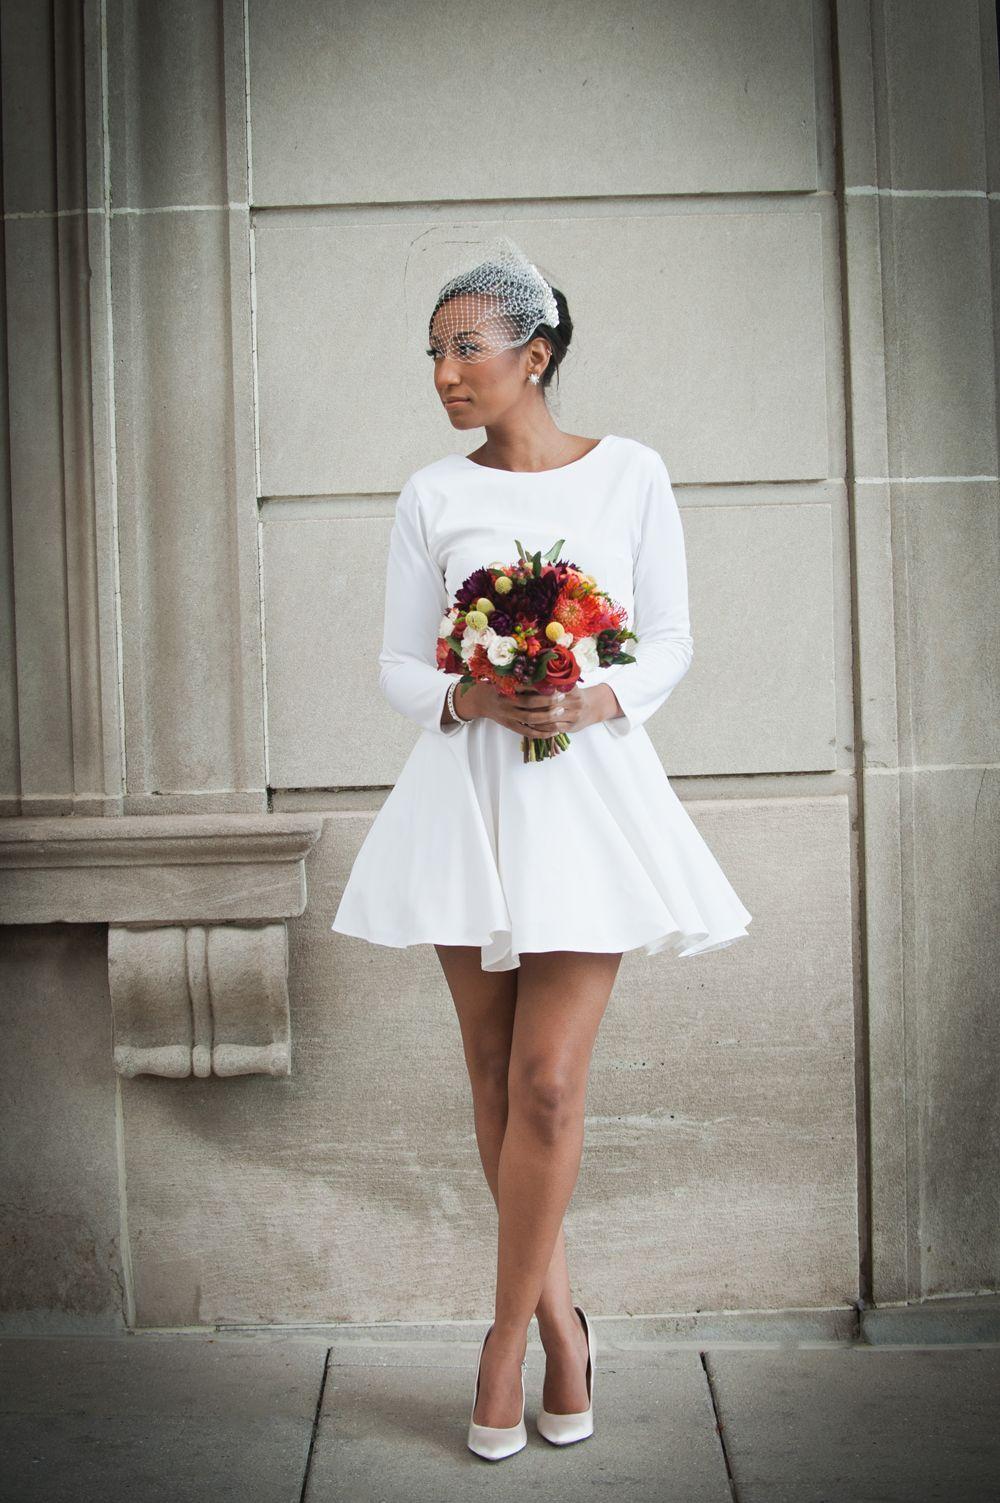 Chic washington dc elopement courthouse wedding dress